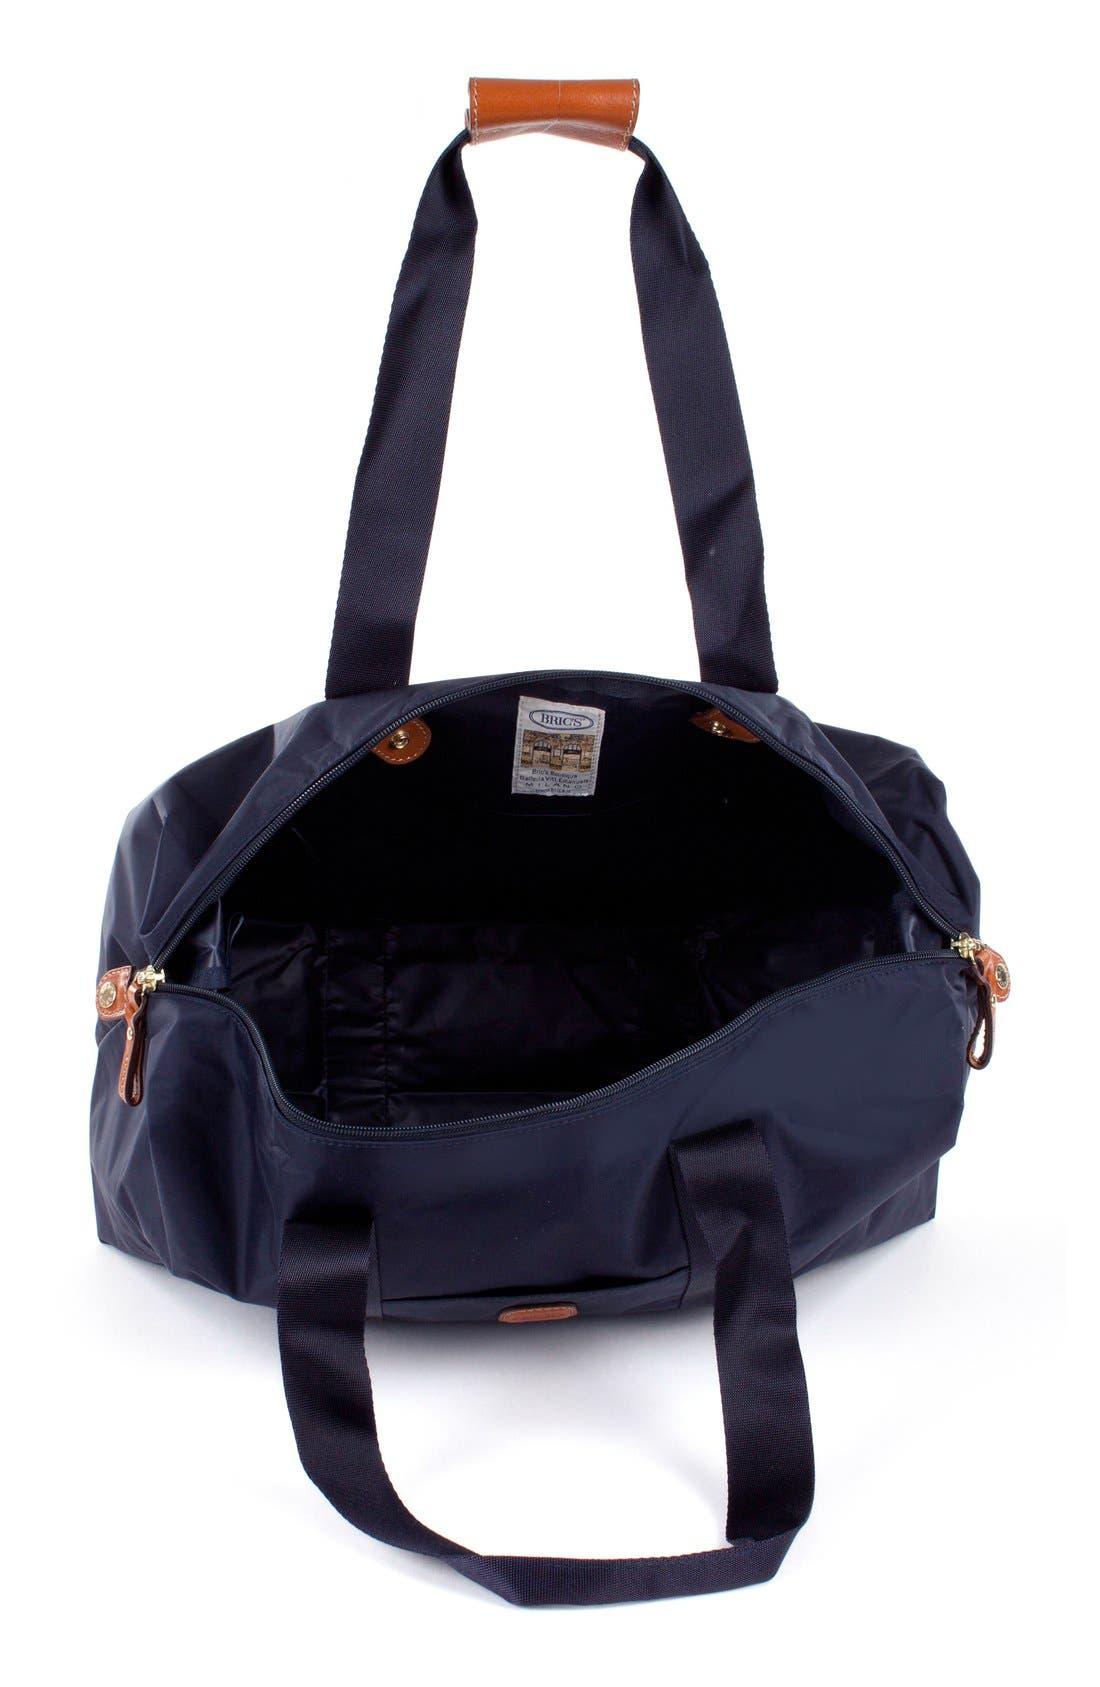 Alternate Image 4  - Bric's 'X-Bag' Folding Duffel Bag (18 Inch)